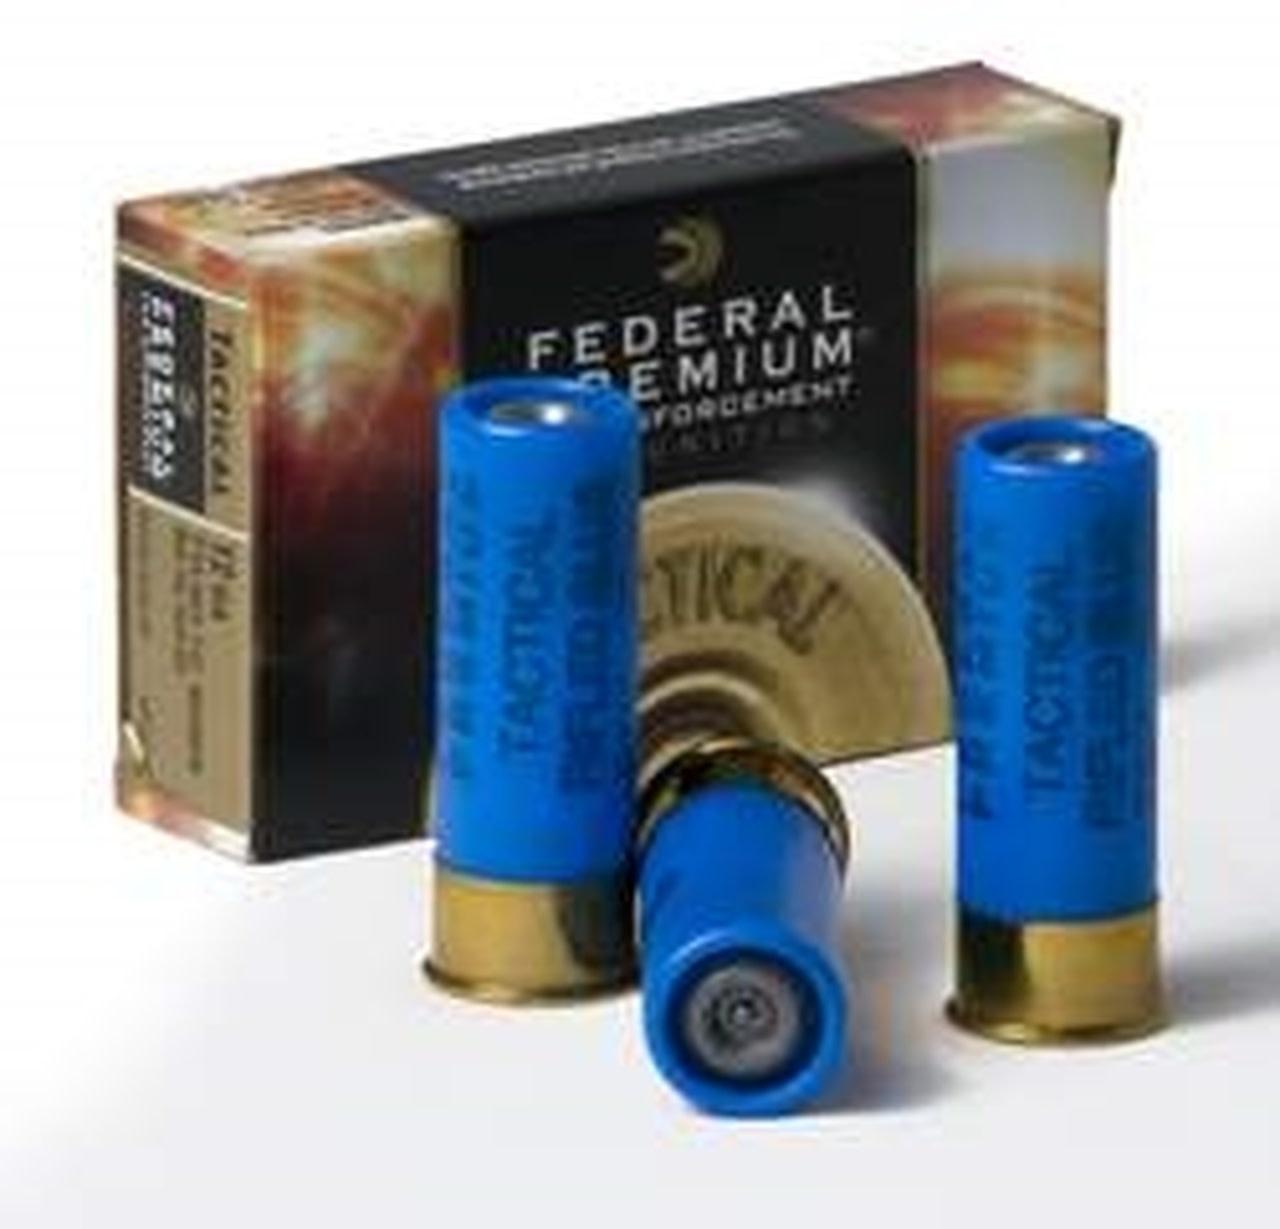 Ammo, Federal Premium Tactical LE, 12ga, 2 3/4'', 1oz rifled slug, 5 round box